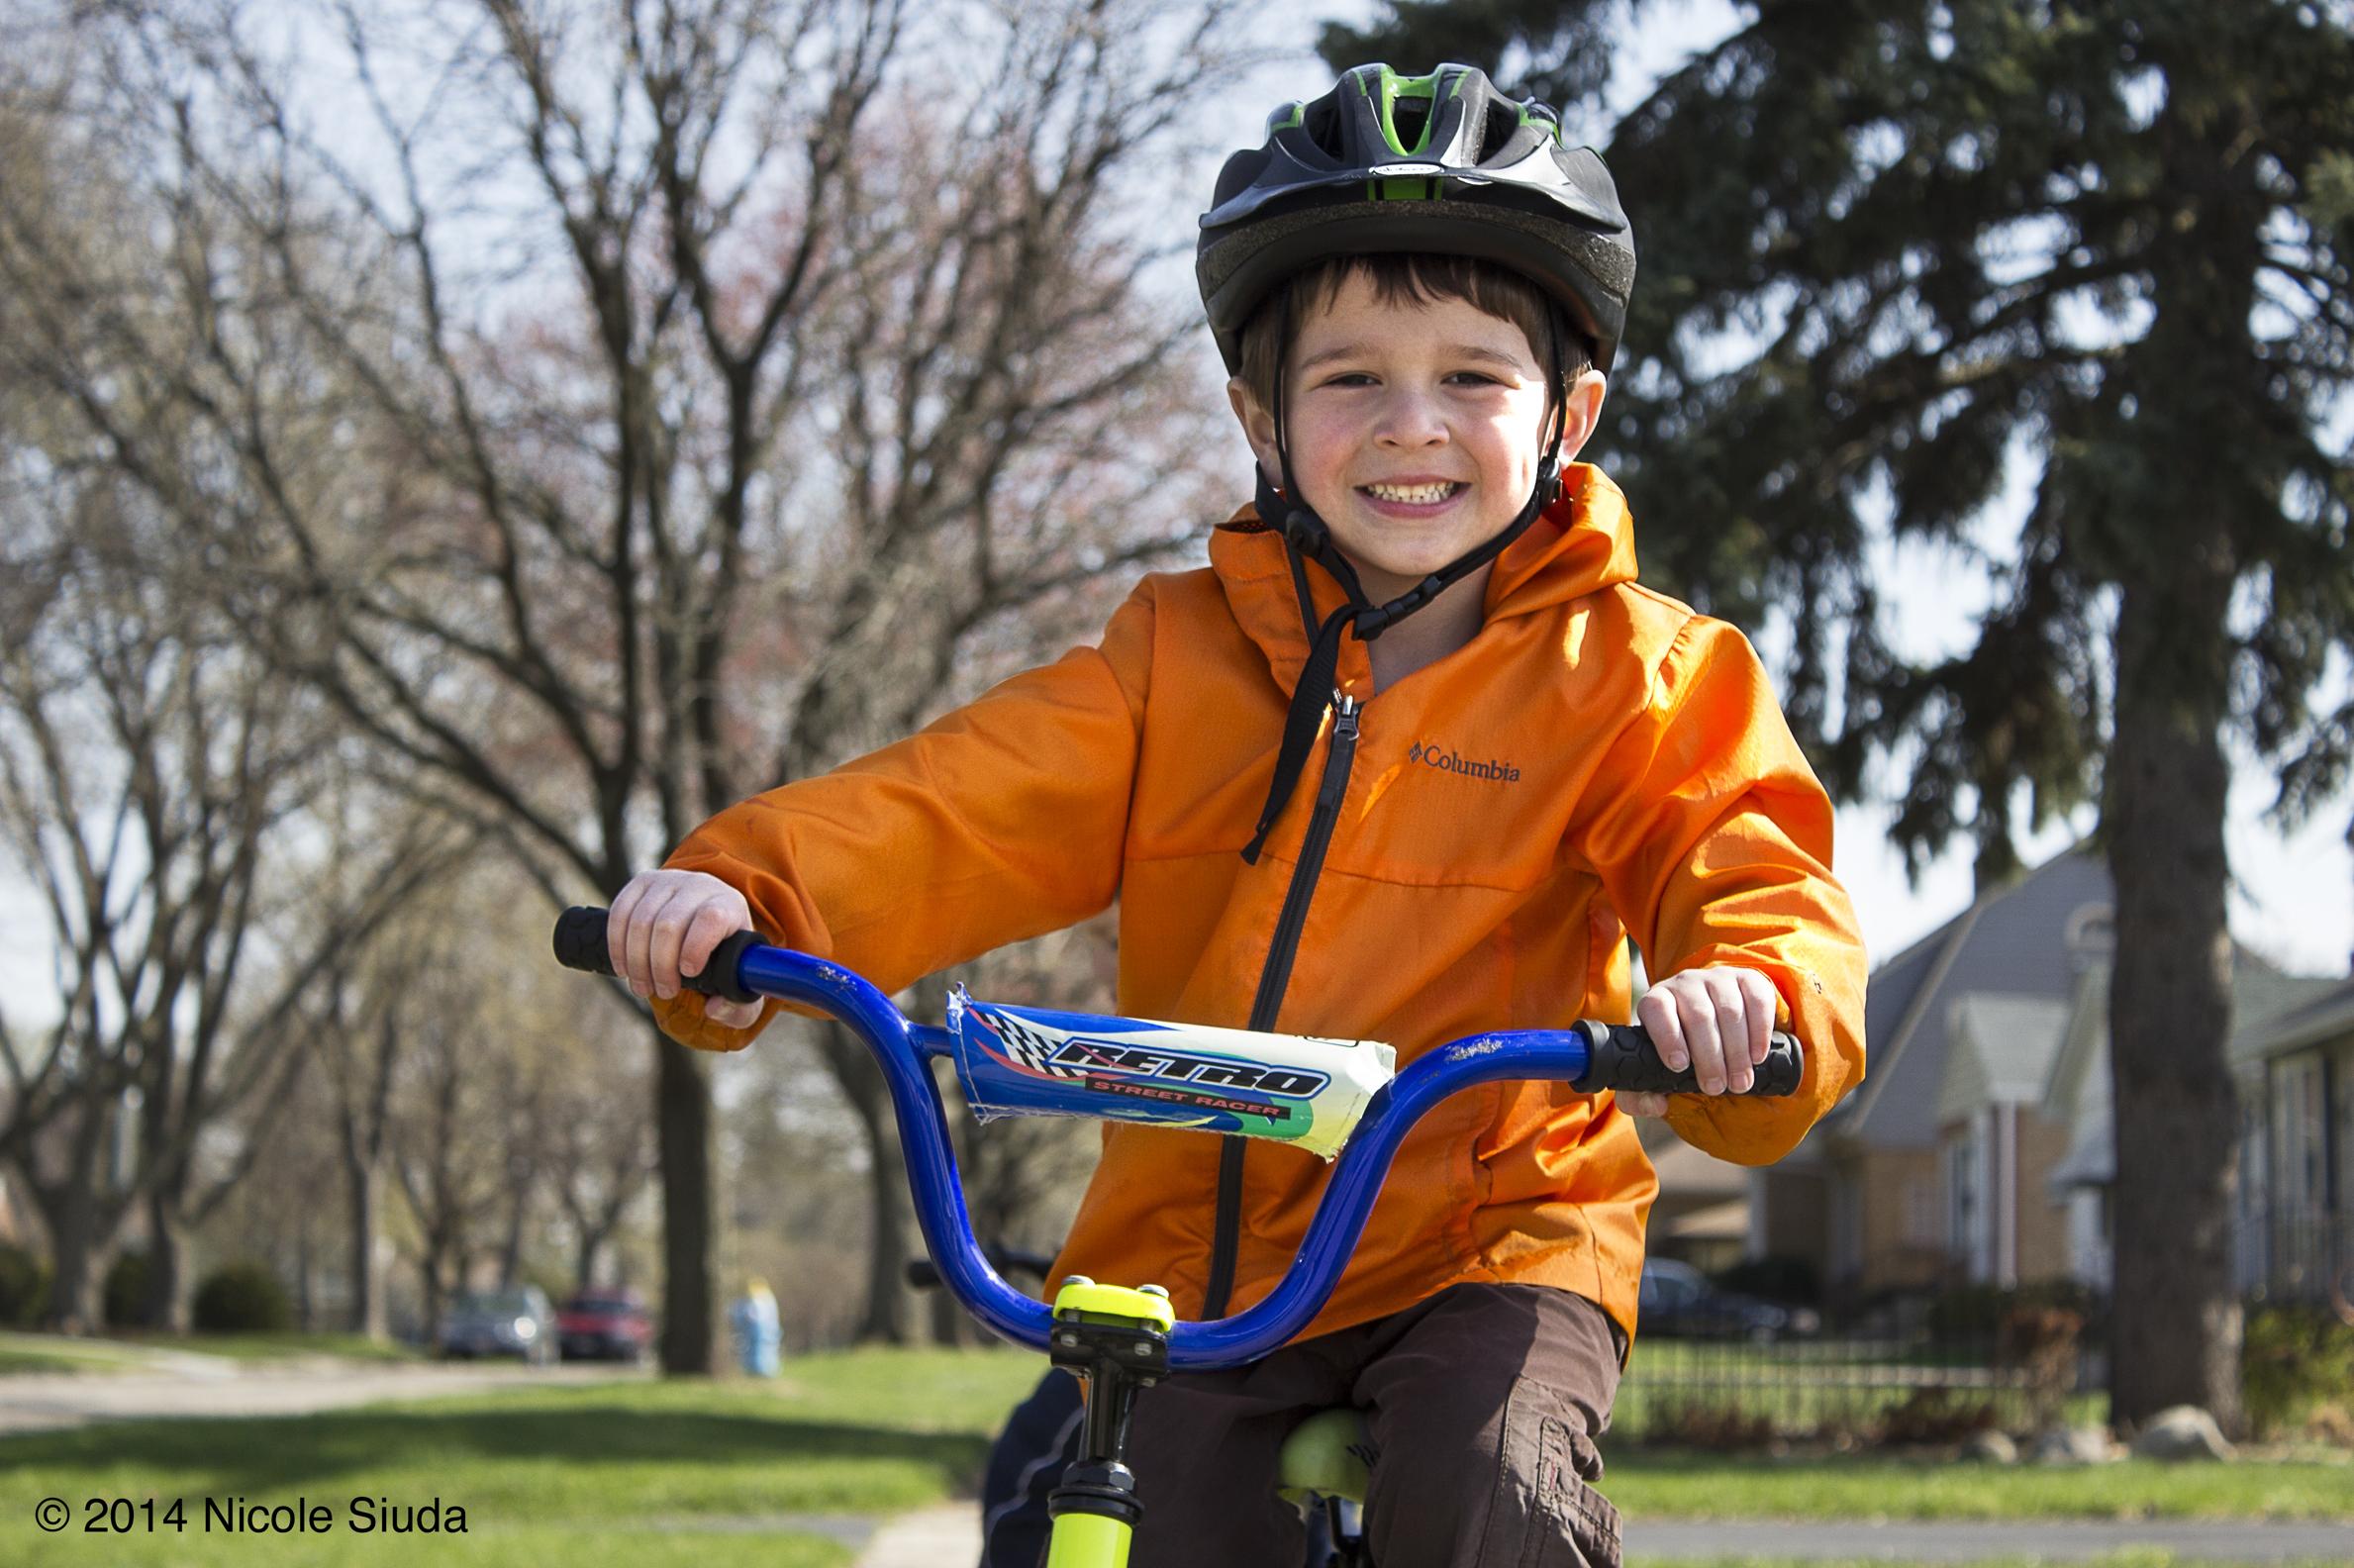 Jorge on bike.jpg